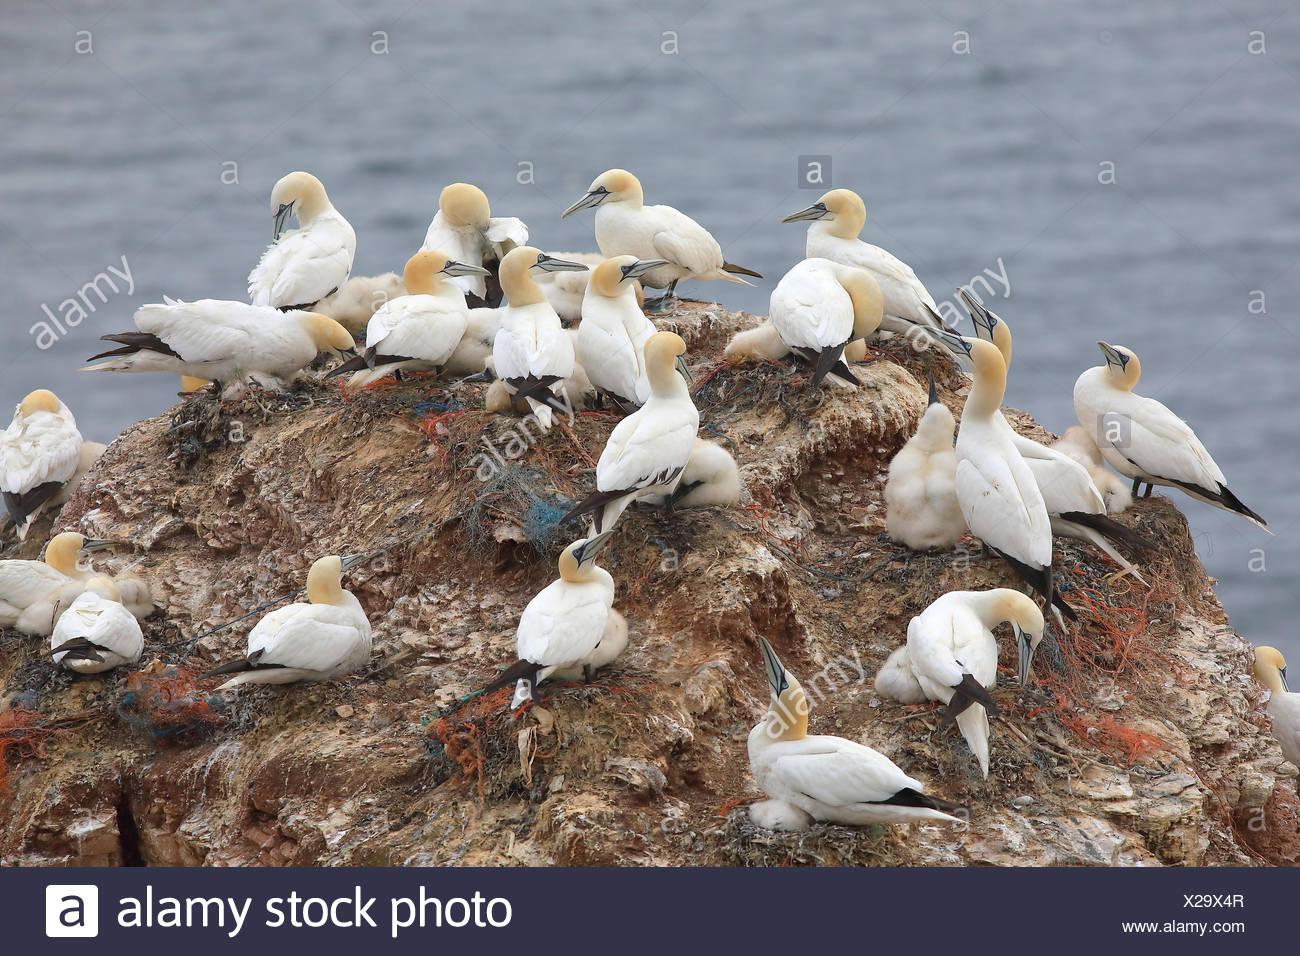 Northern gannets (Morus bassanus), breeding colony on sandstone rock, Heligoland, North Sea, Germany - Stock Image